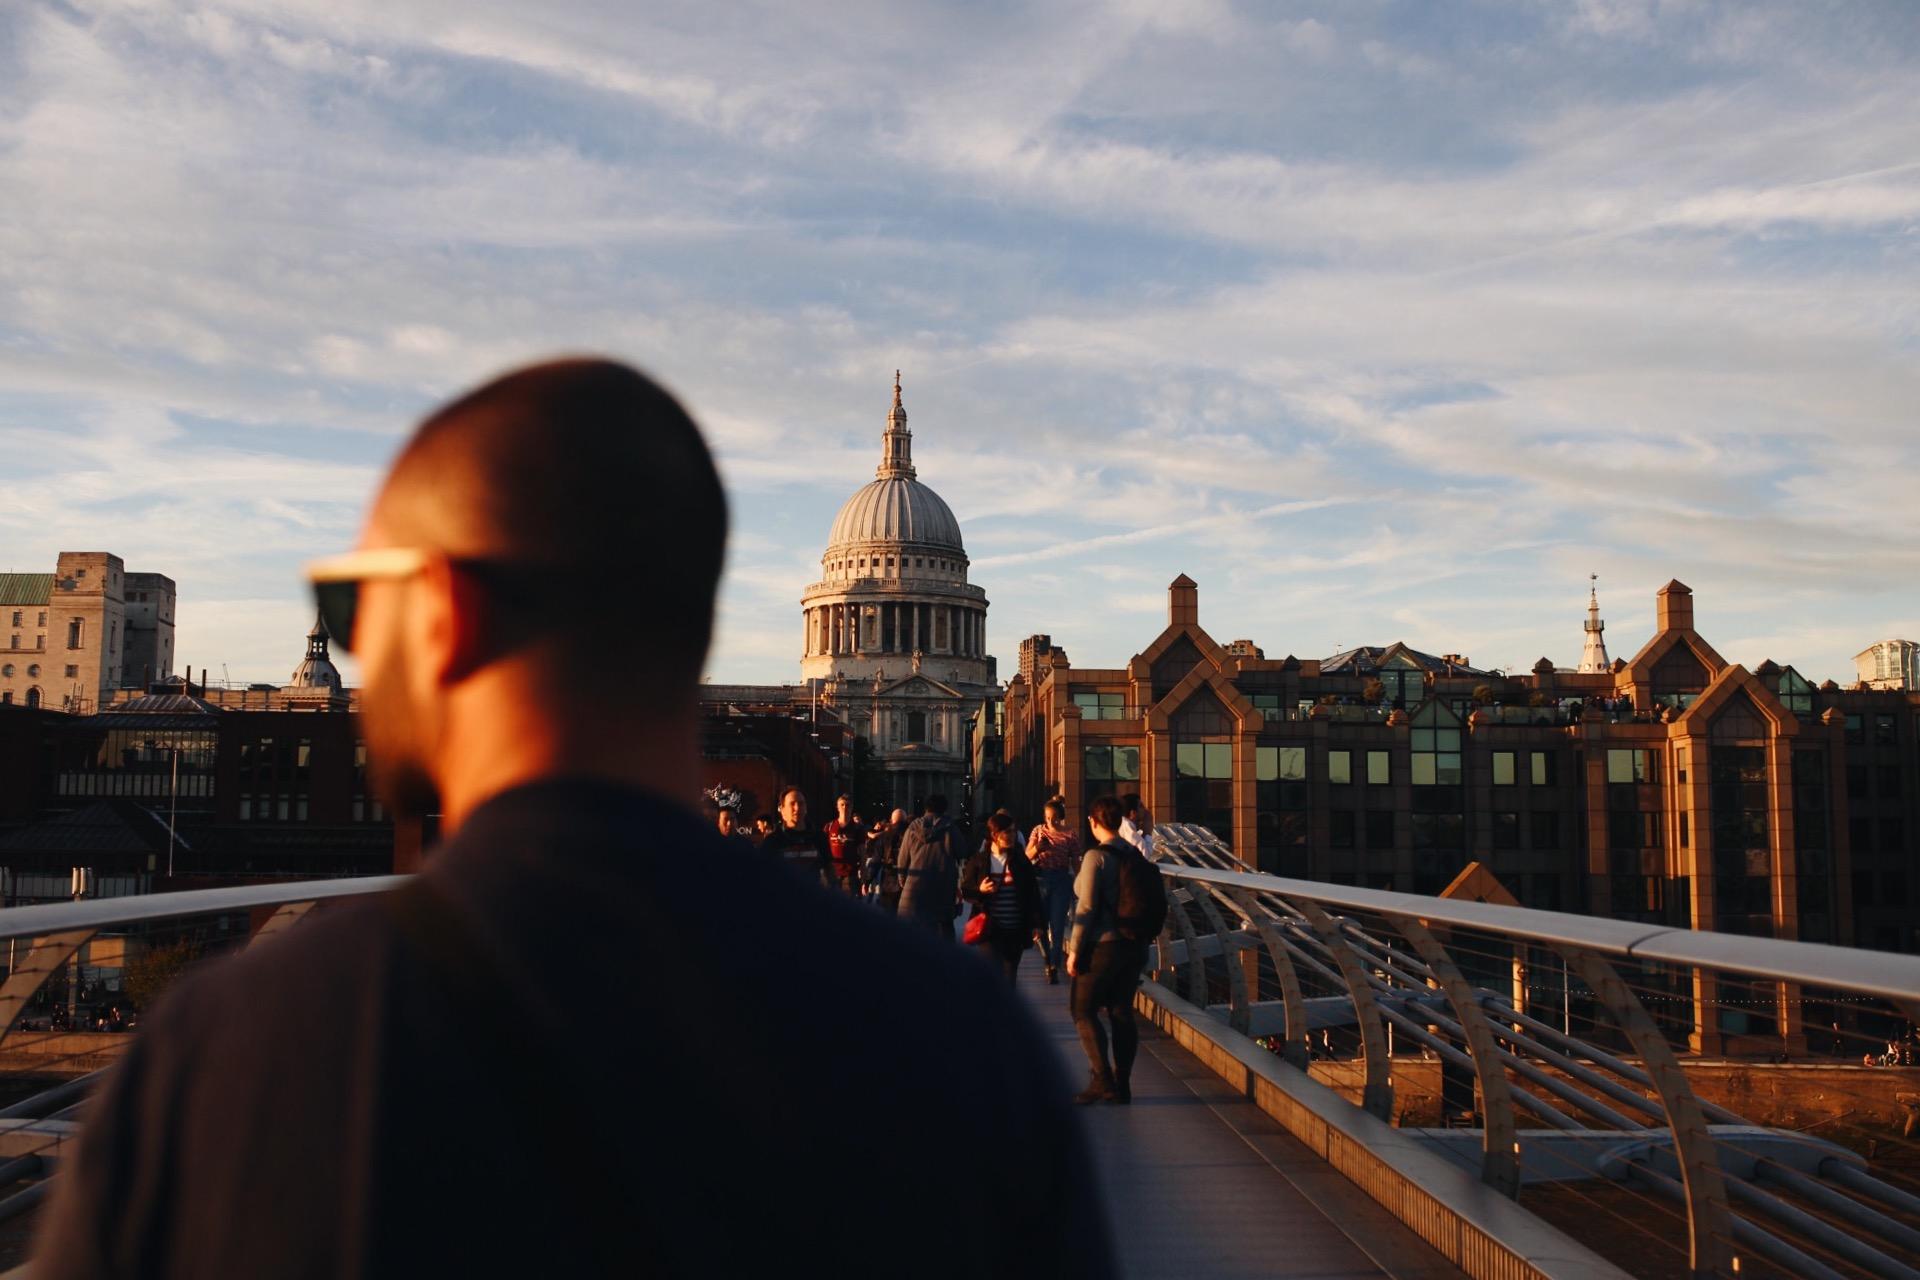 millennium-bridge-blog-voyage-londres.JPG